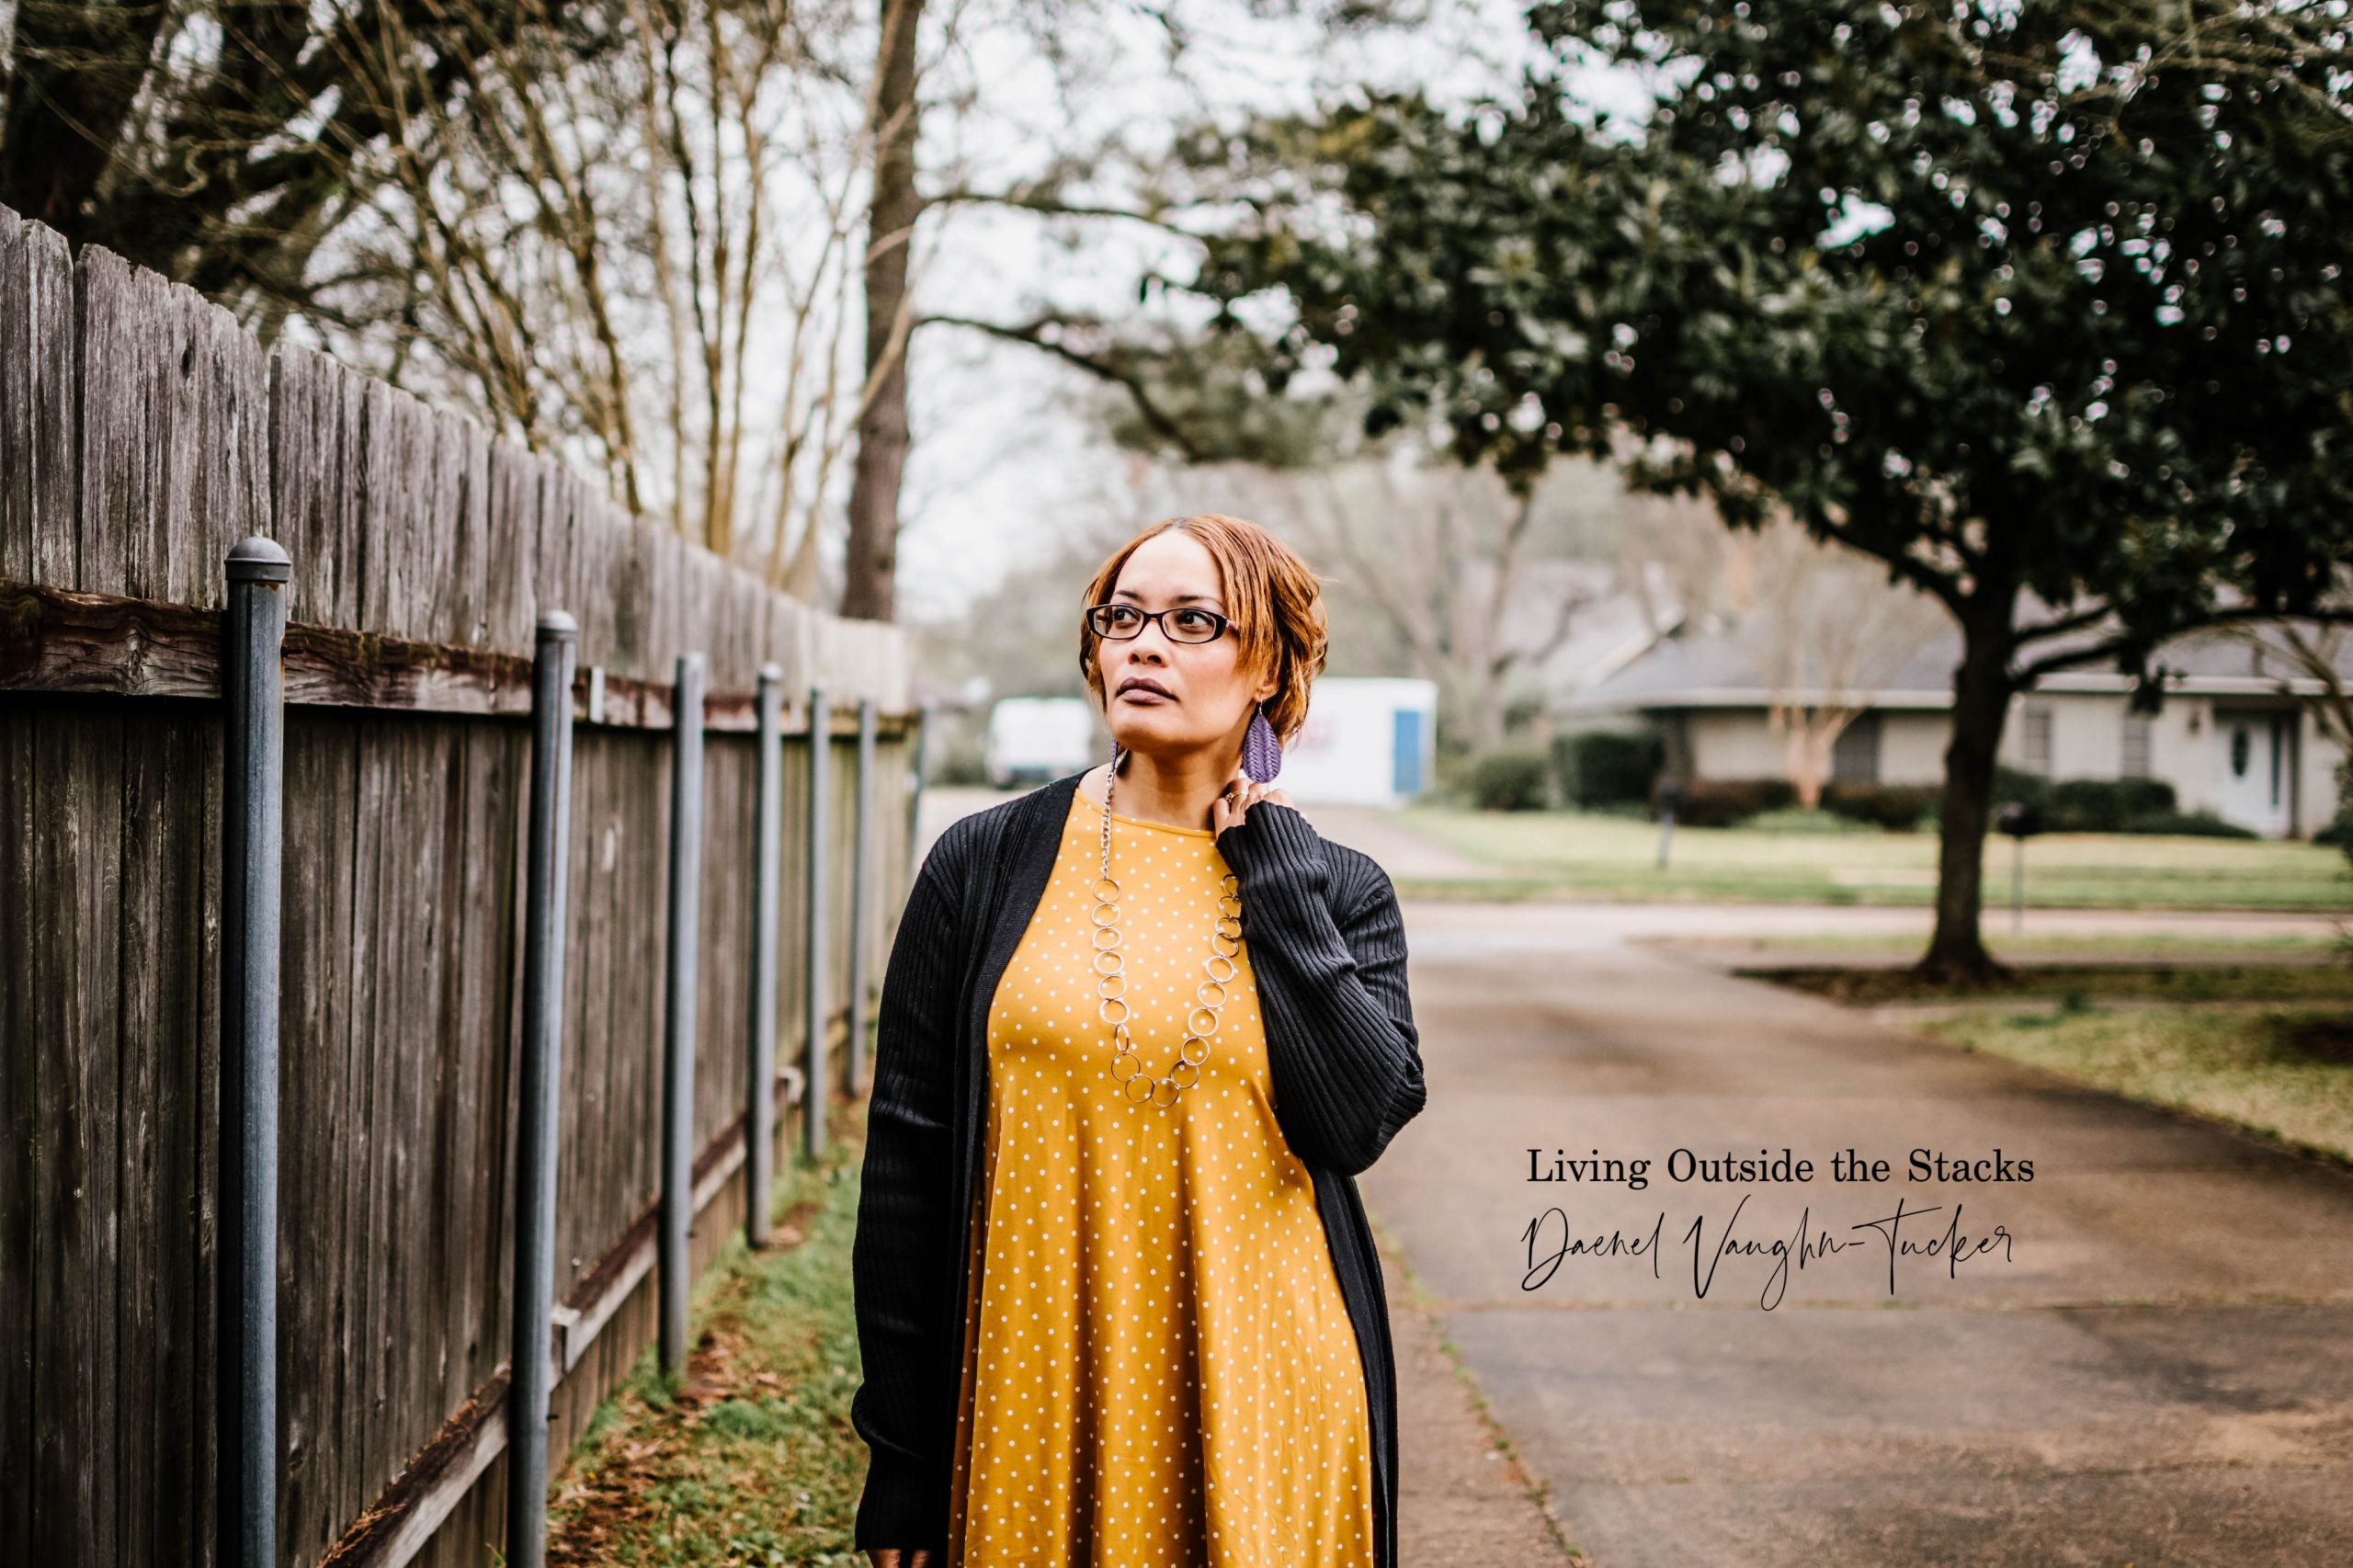 Black Cardigan Polka Dot Mustard Dress {living outside the stacks